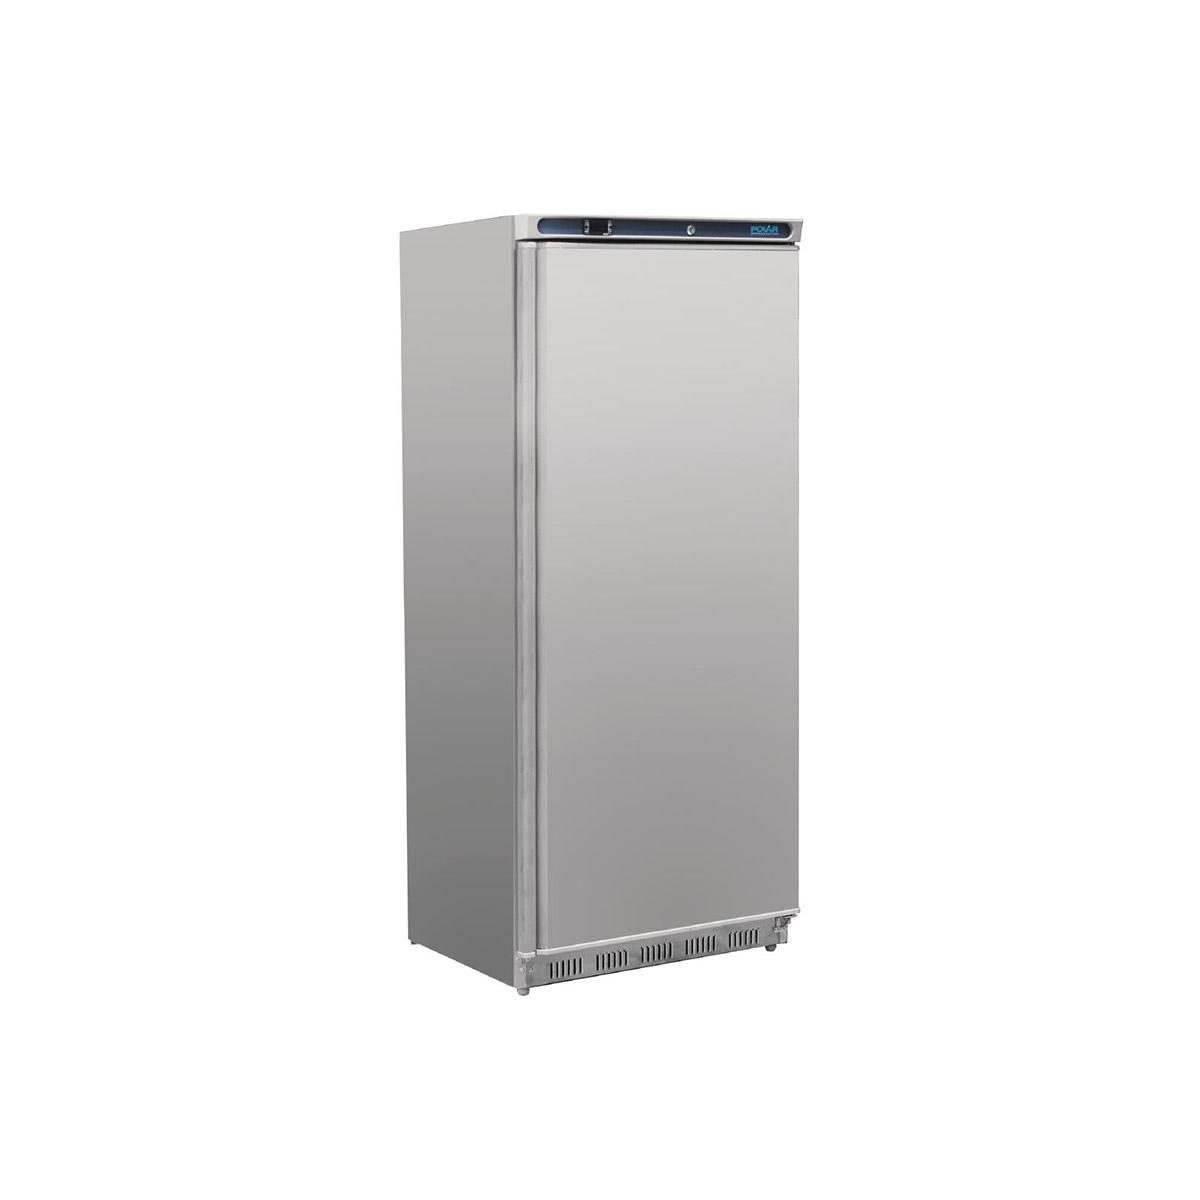 Polar C-Series Upright Freezer 600Ltr